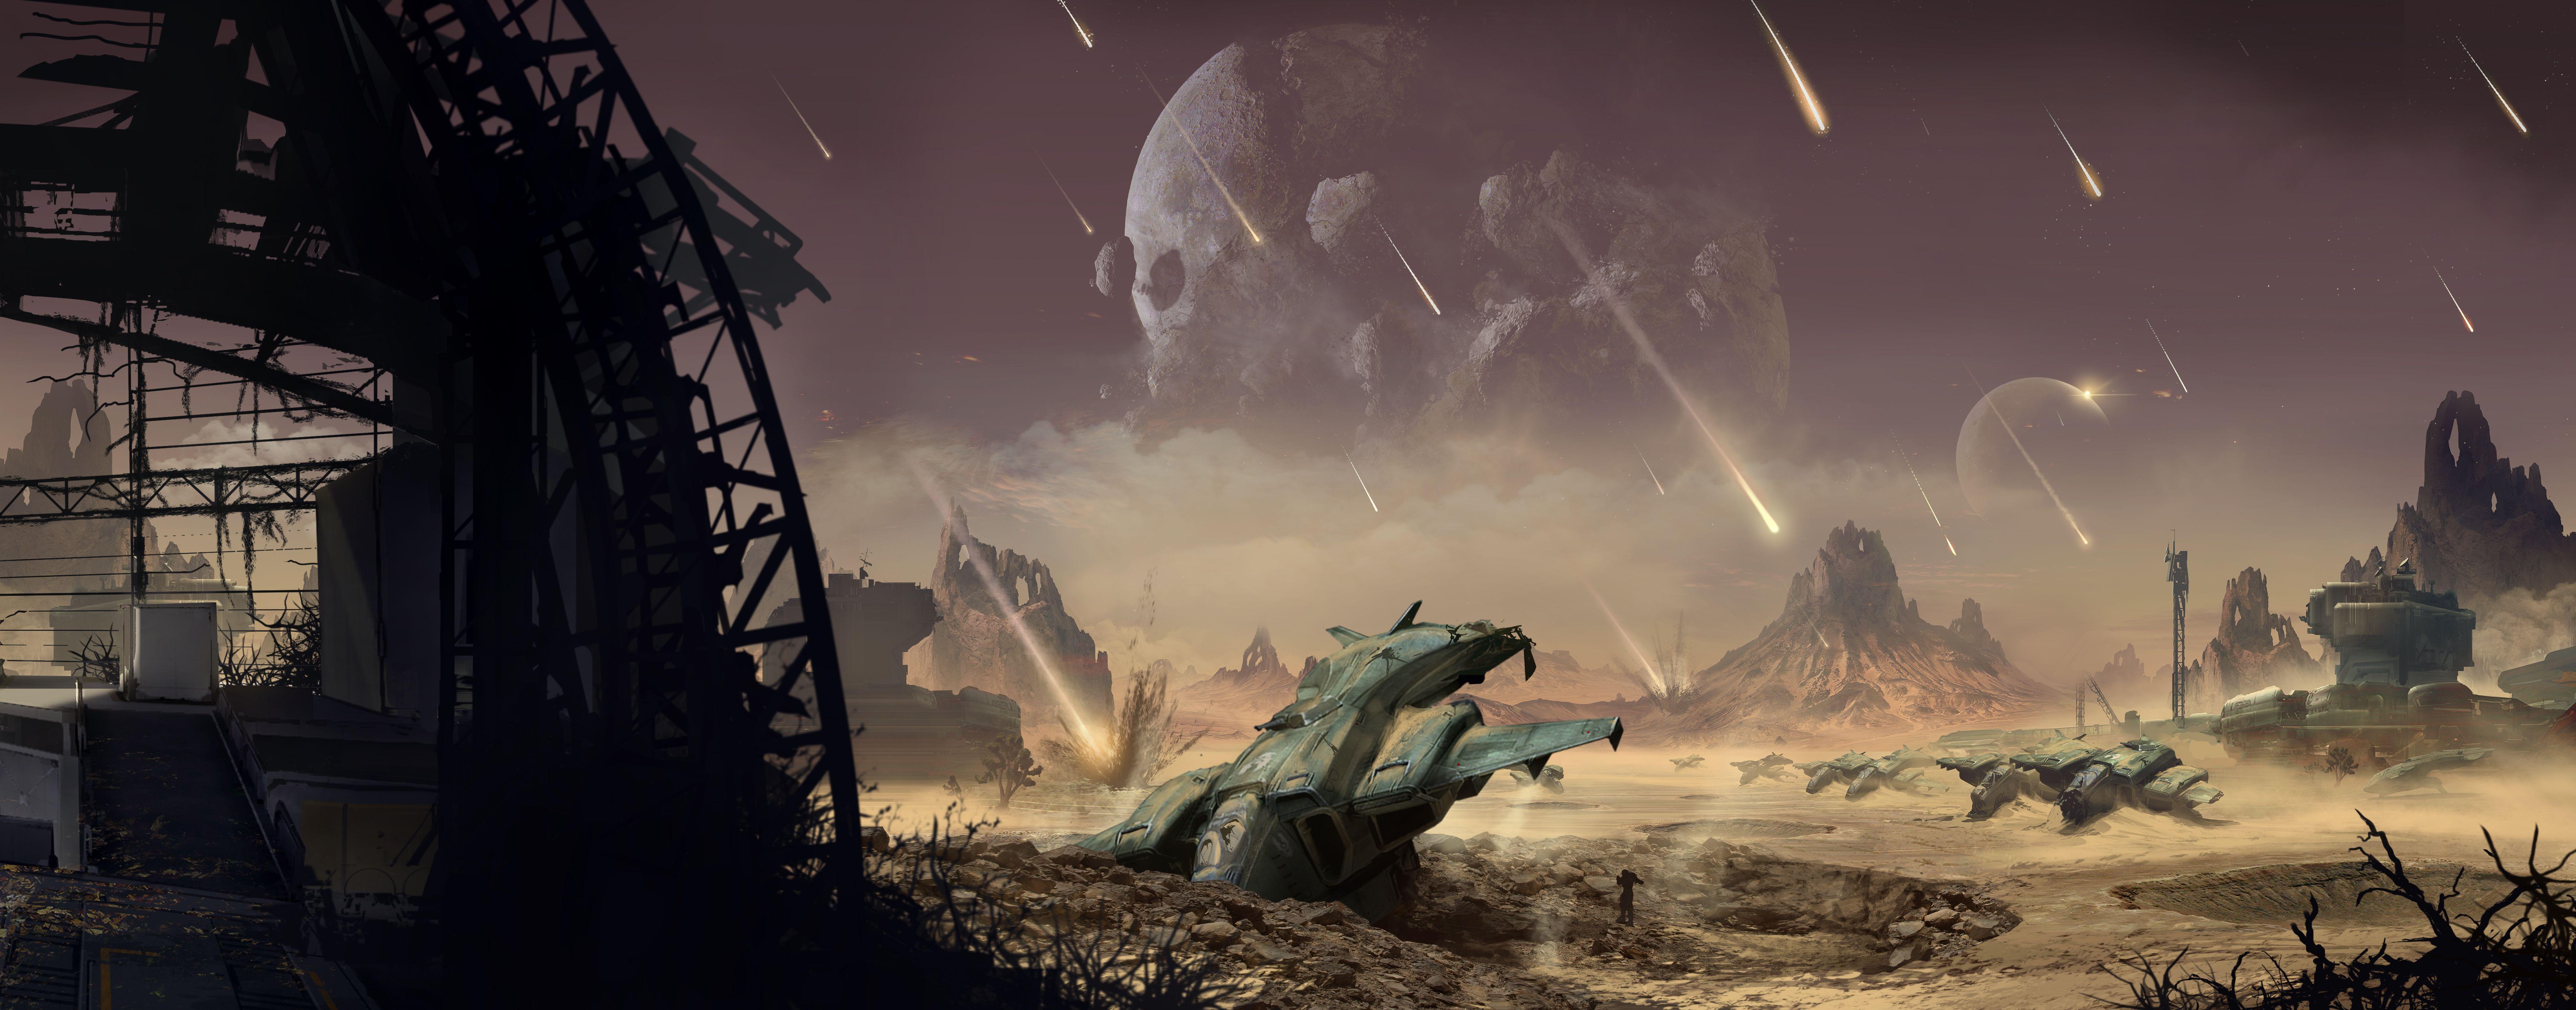 Halo 4 Bullseye Map Pack: Pitfall | Halo 4 | Halo, Armor